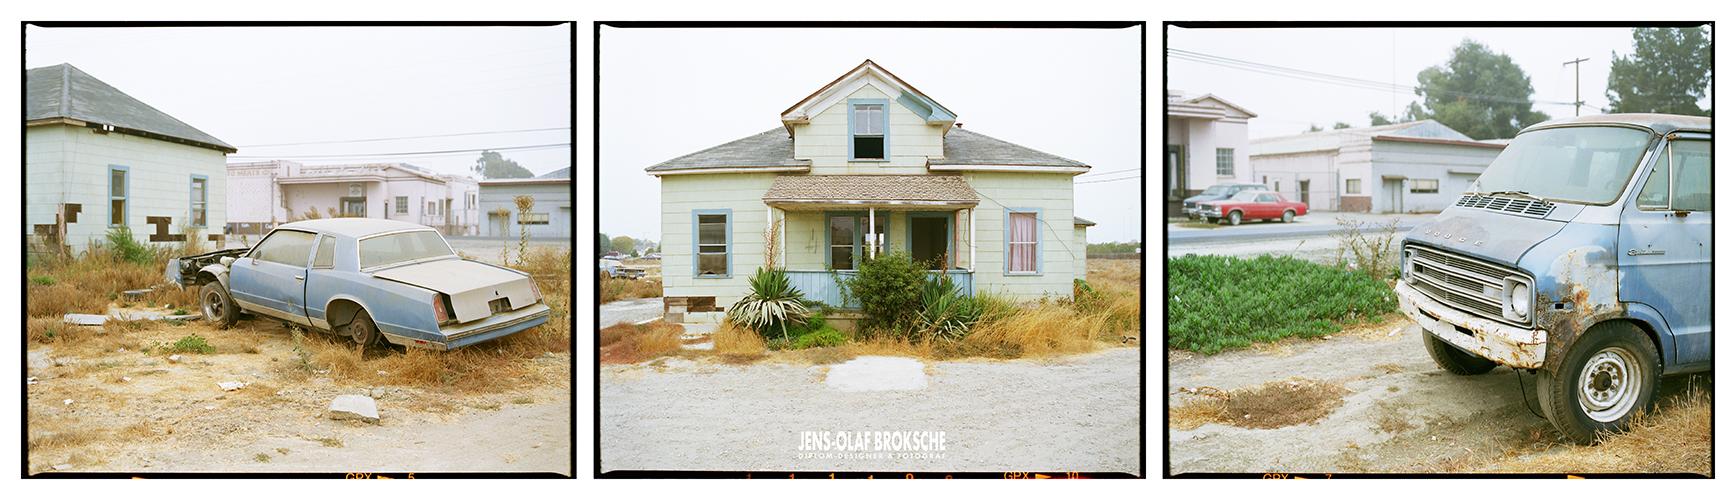 Hollister_Montage_06_2012